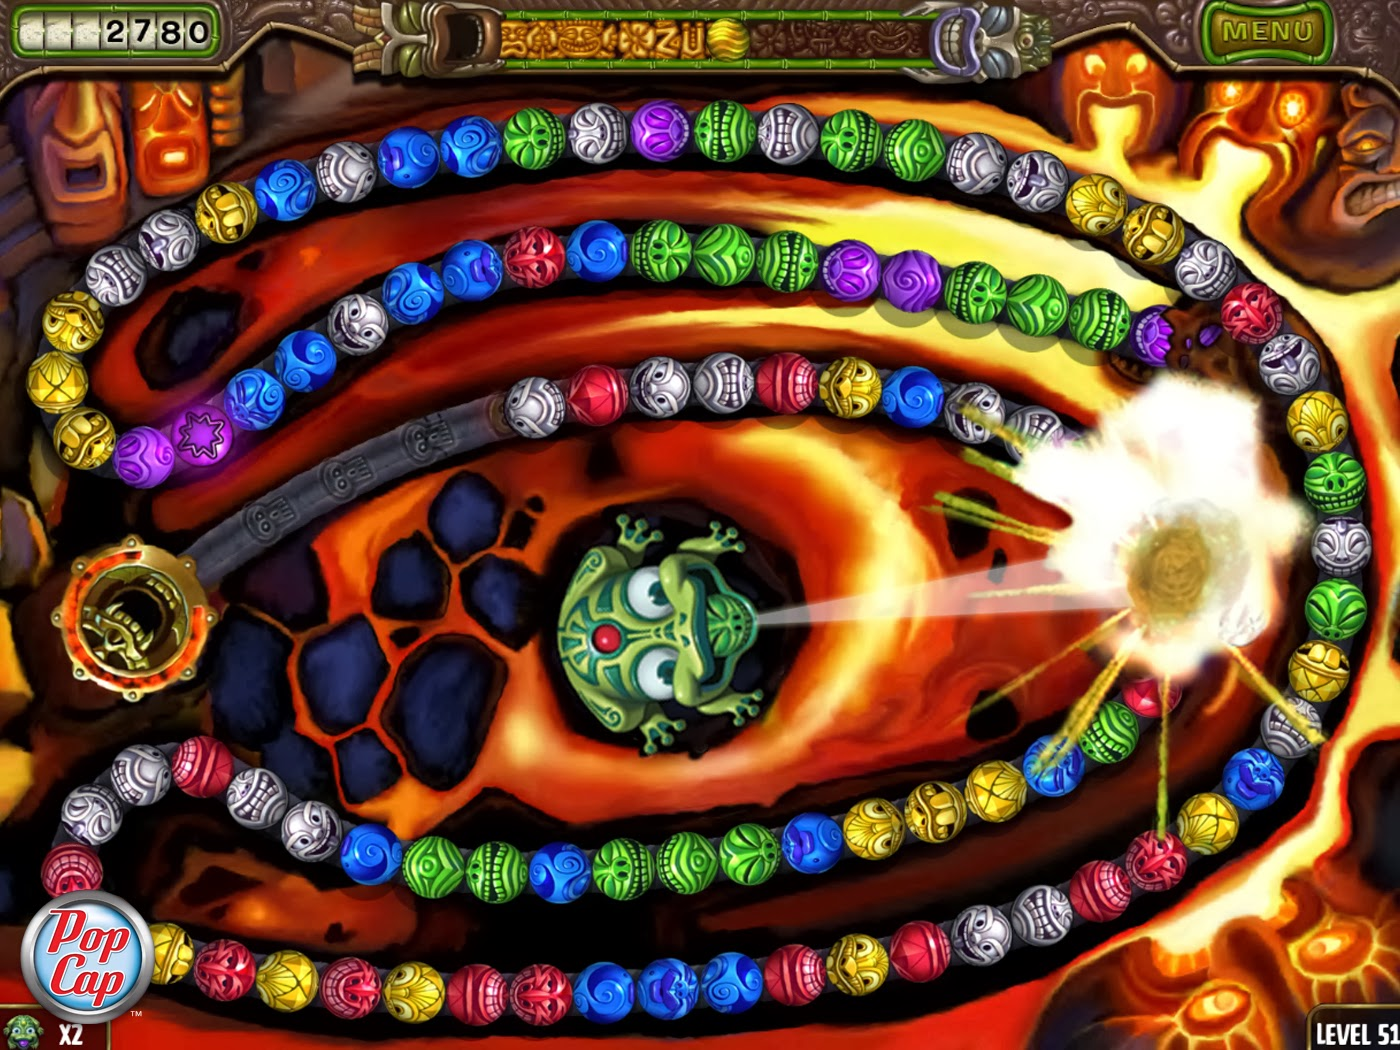 Free Download Game Zuma Revenge Full Version For Pc